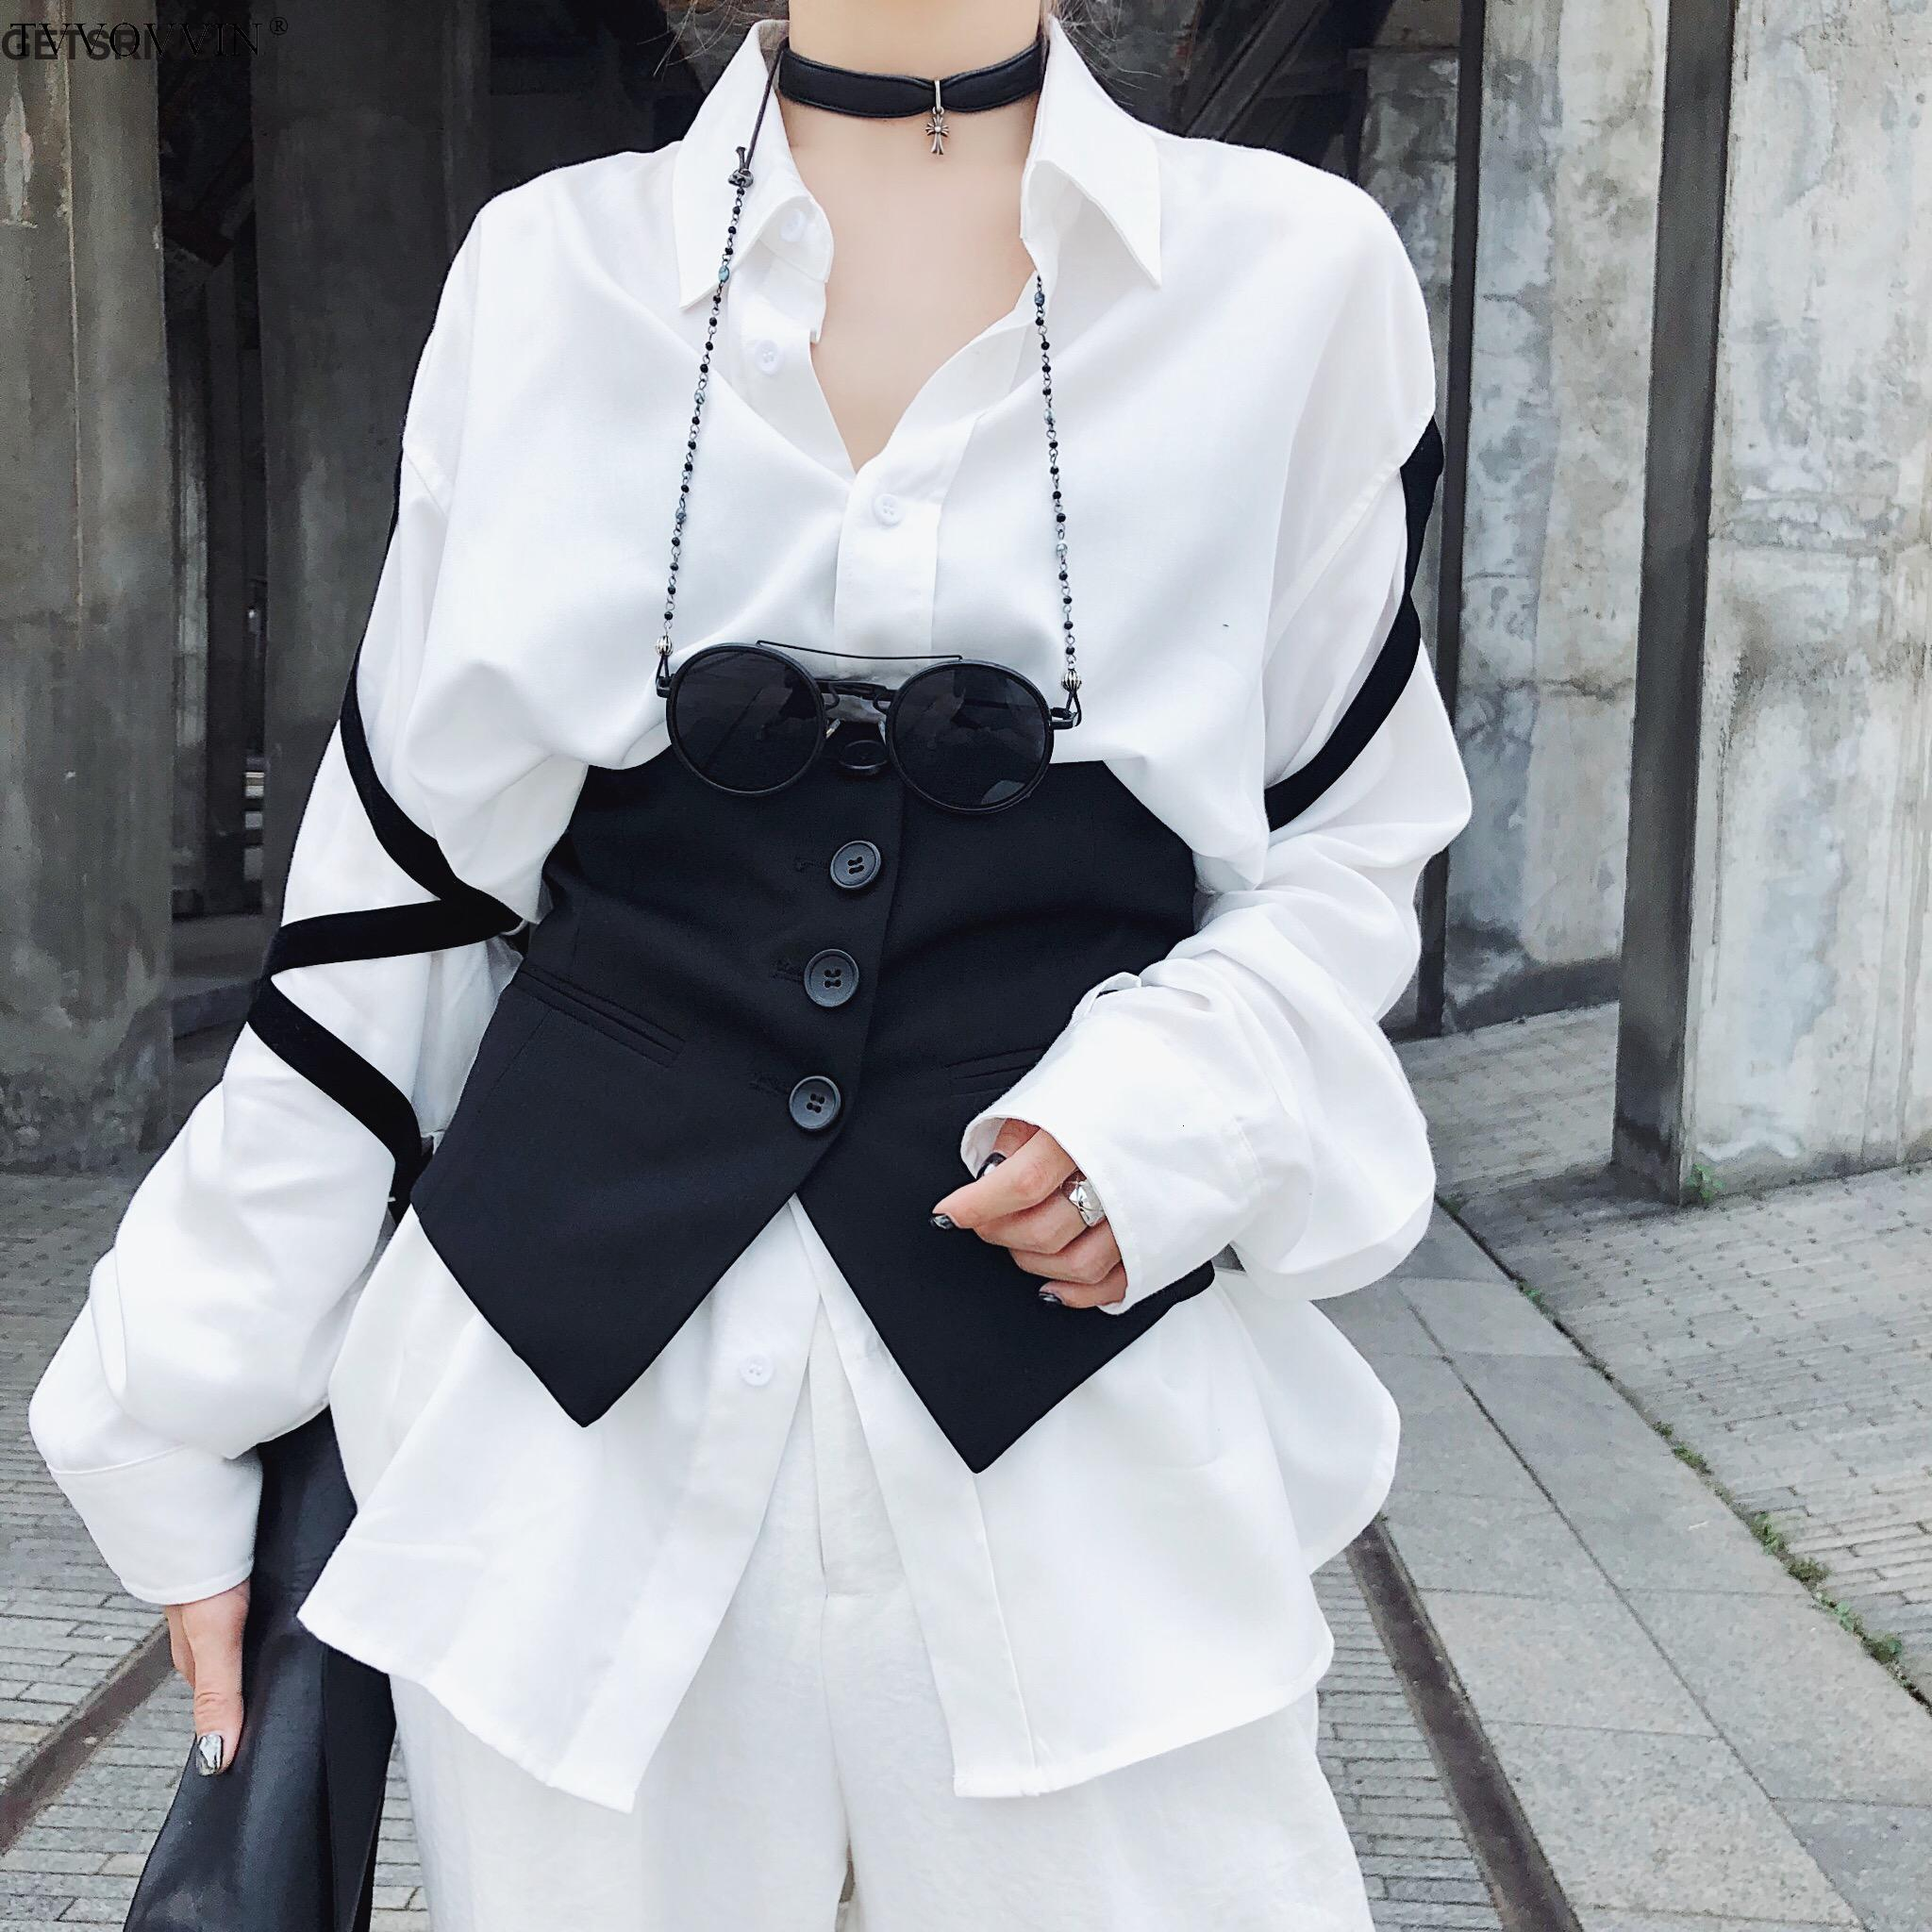 Woman Girdle Black Wild Burr Corset Belt Asymmetry Fashion Vintage Cotton Corset Belts 2019 Casual Sexy Girdle Woman E956